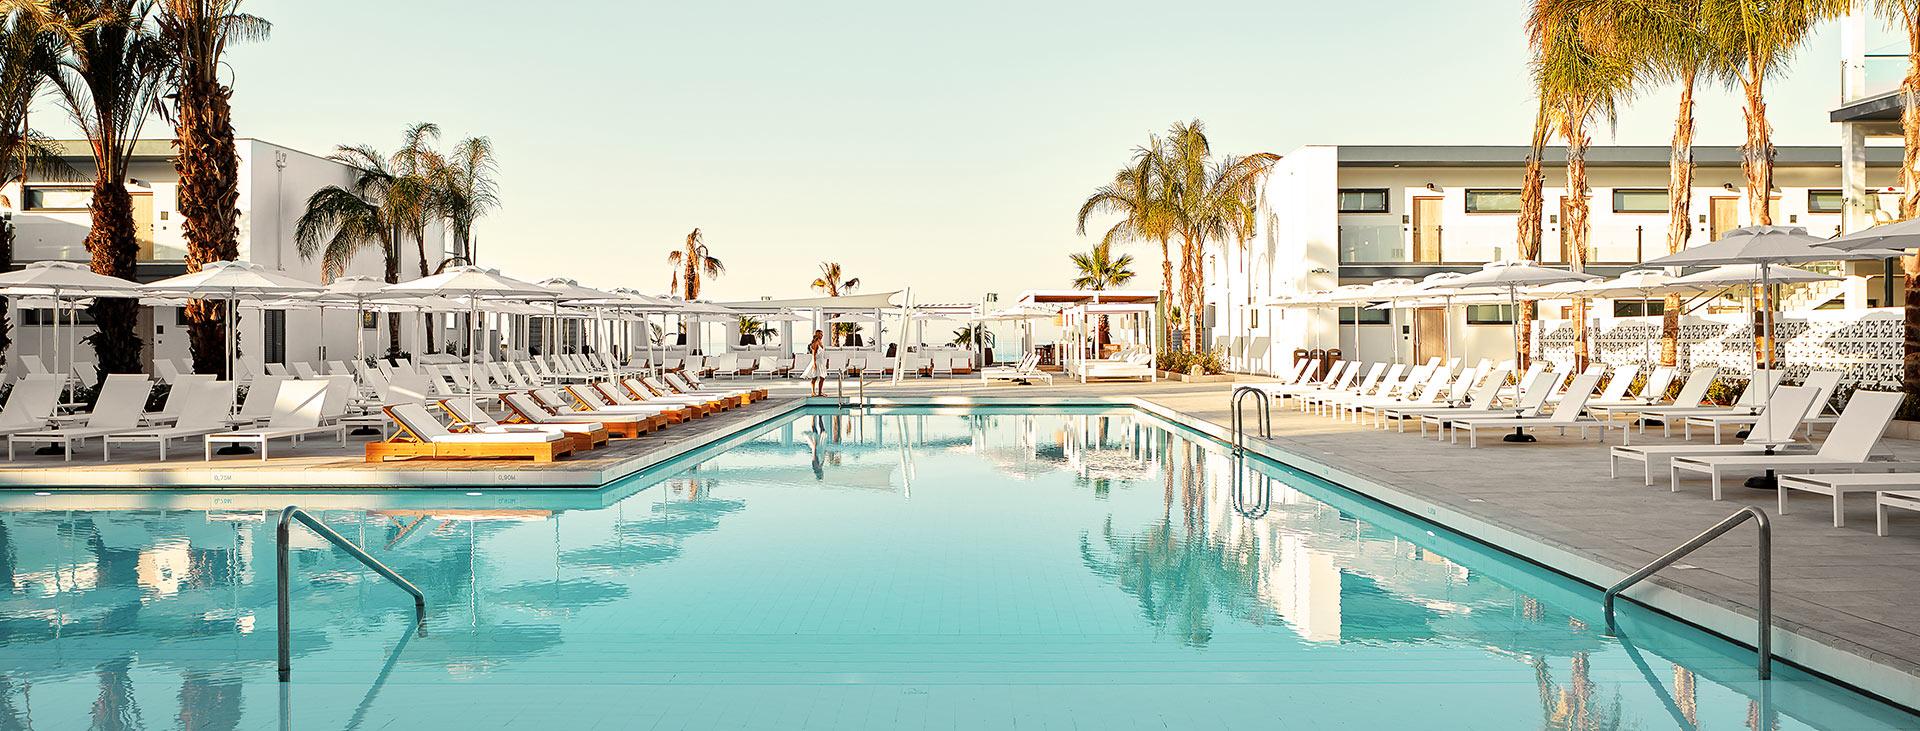 Karta Cypern Flygplats.Ocean Beach Club Cypern I Ayia Napa Familjesemester Med Ving